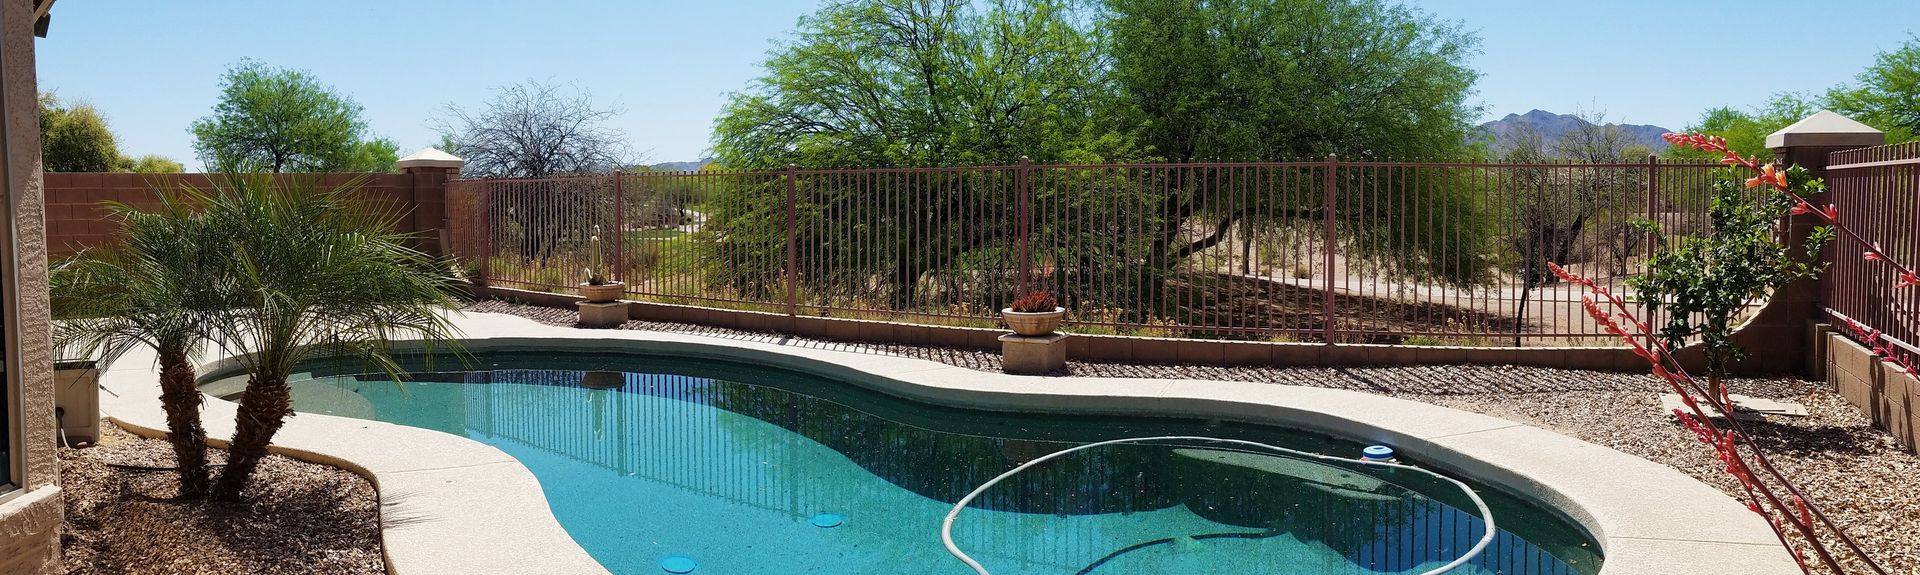 Seville, Gilbert, Arizona, United States of America